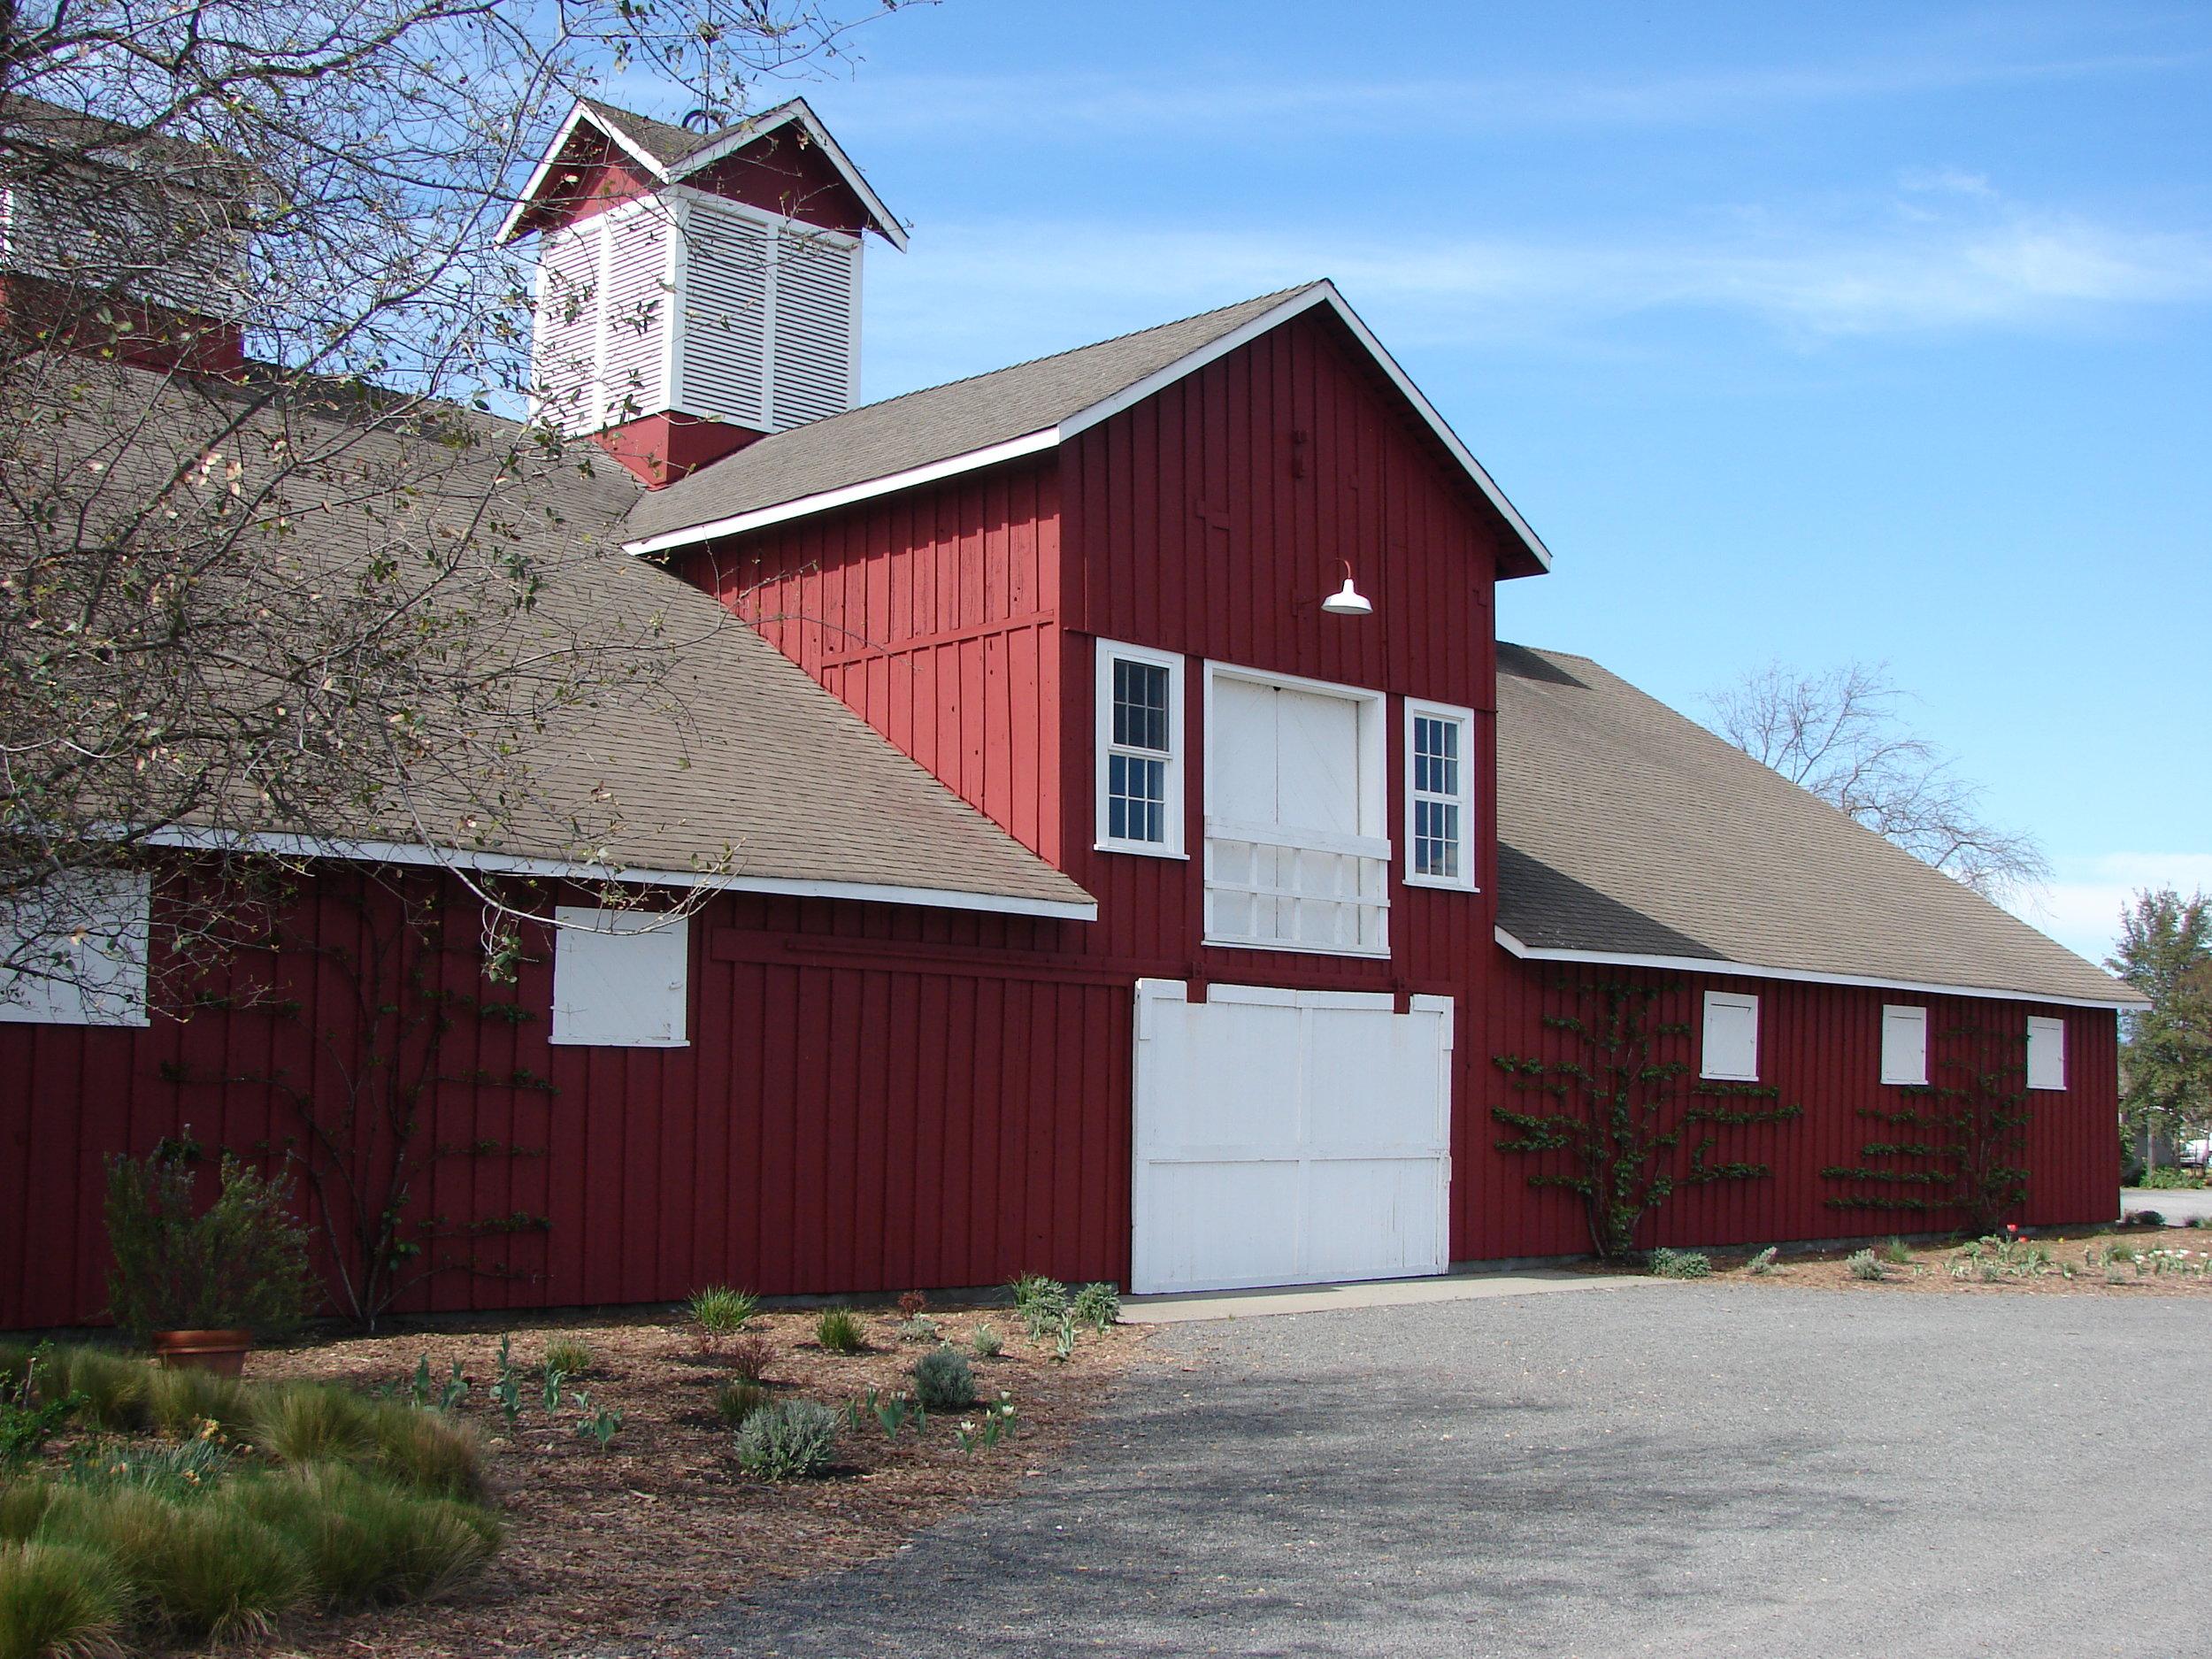 Historical Red Barn 2 Saint Helena.JPG